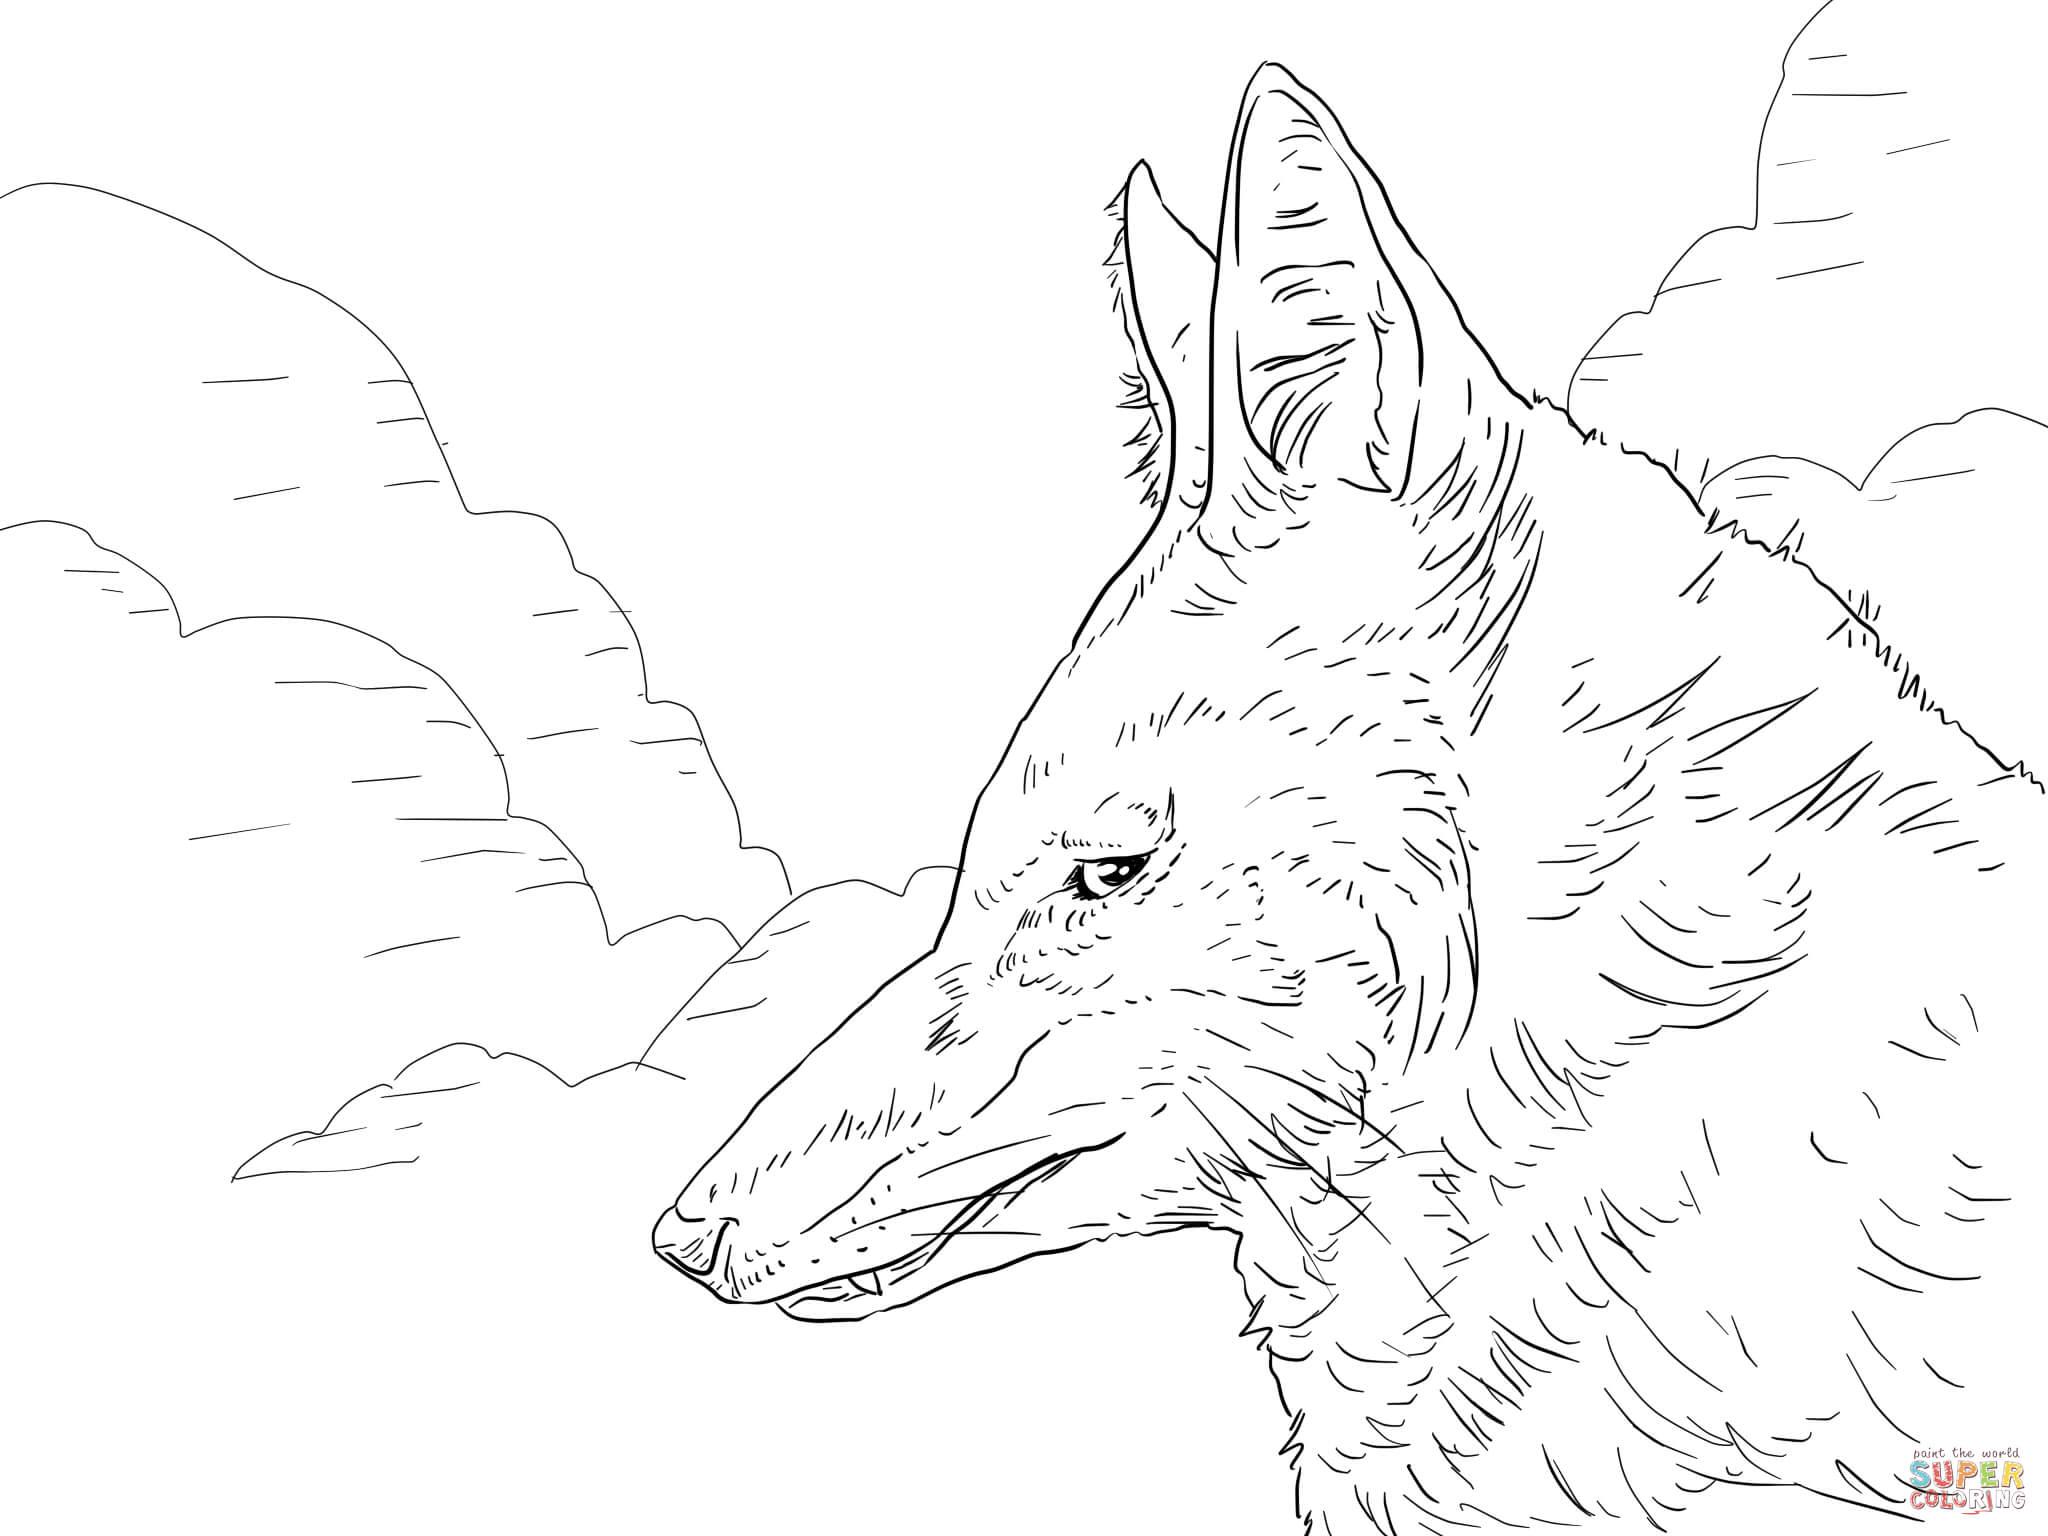 Como Dibujar Lobos. Beautiful Dibujo De Un Lobo Negro Y